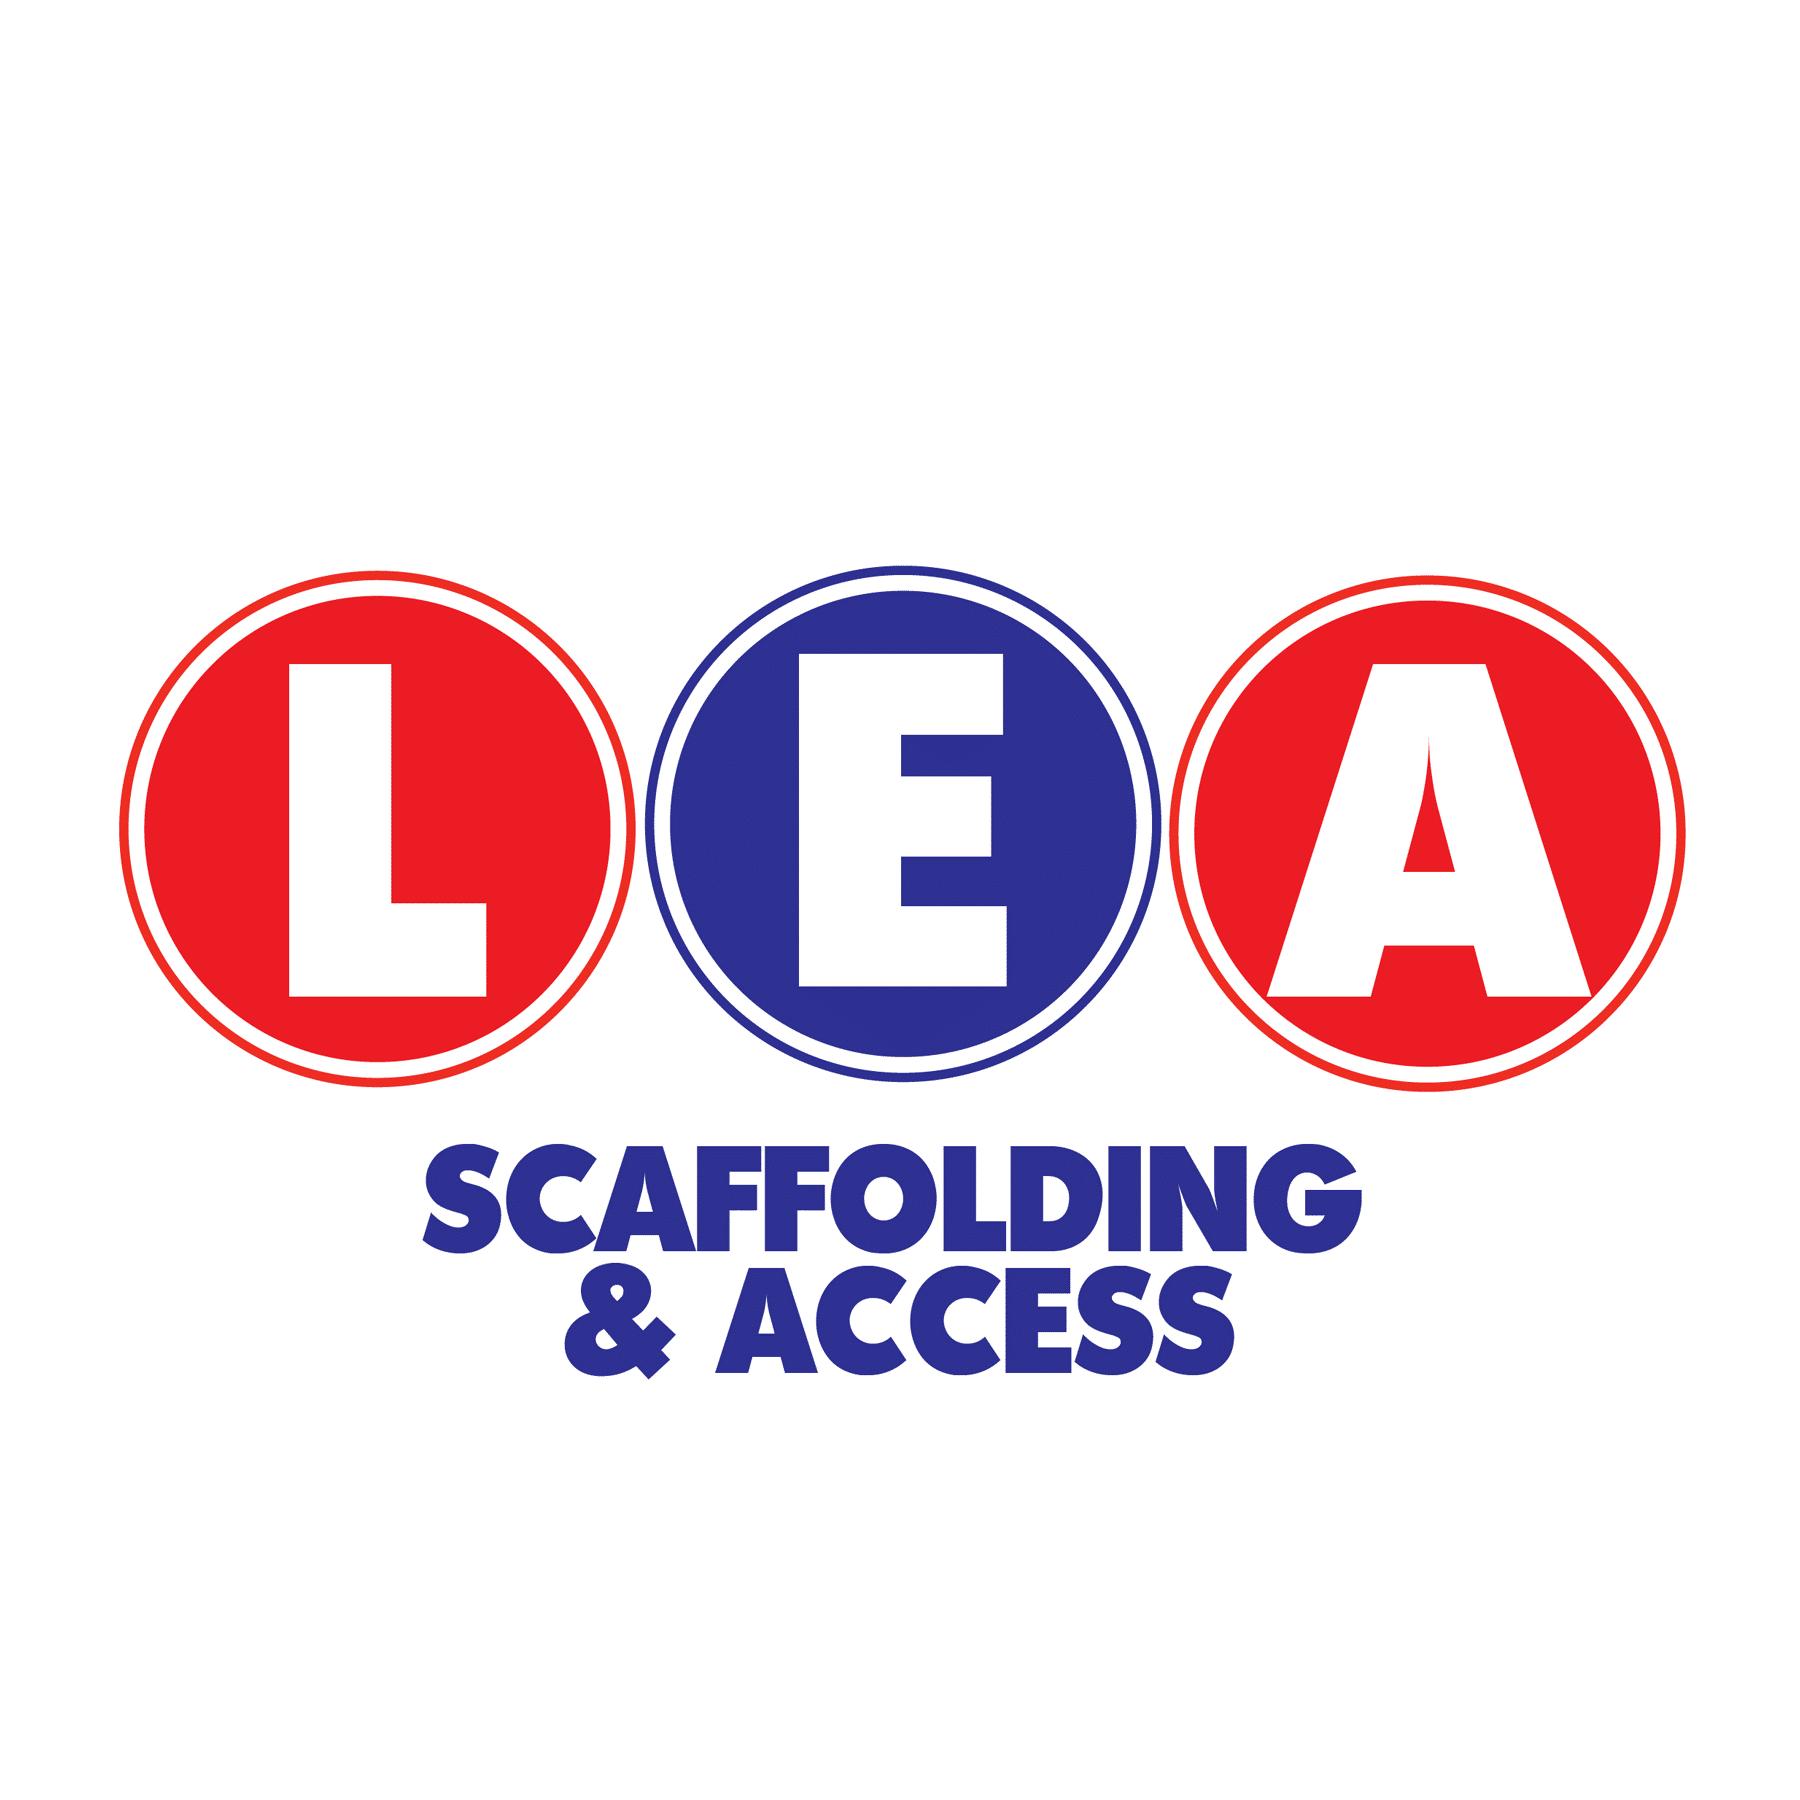 LEA Scaffolding & Access Logo